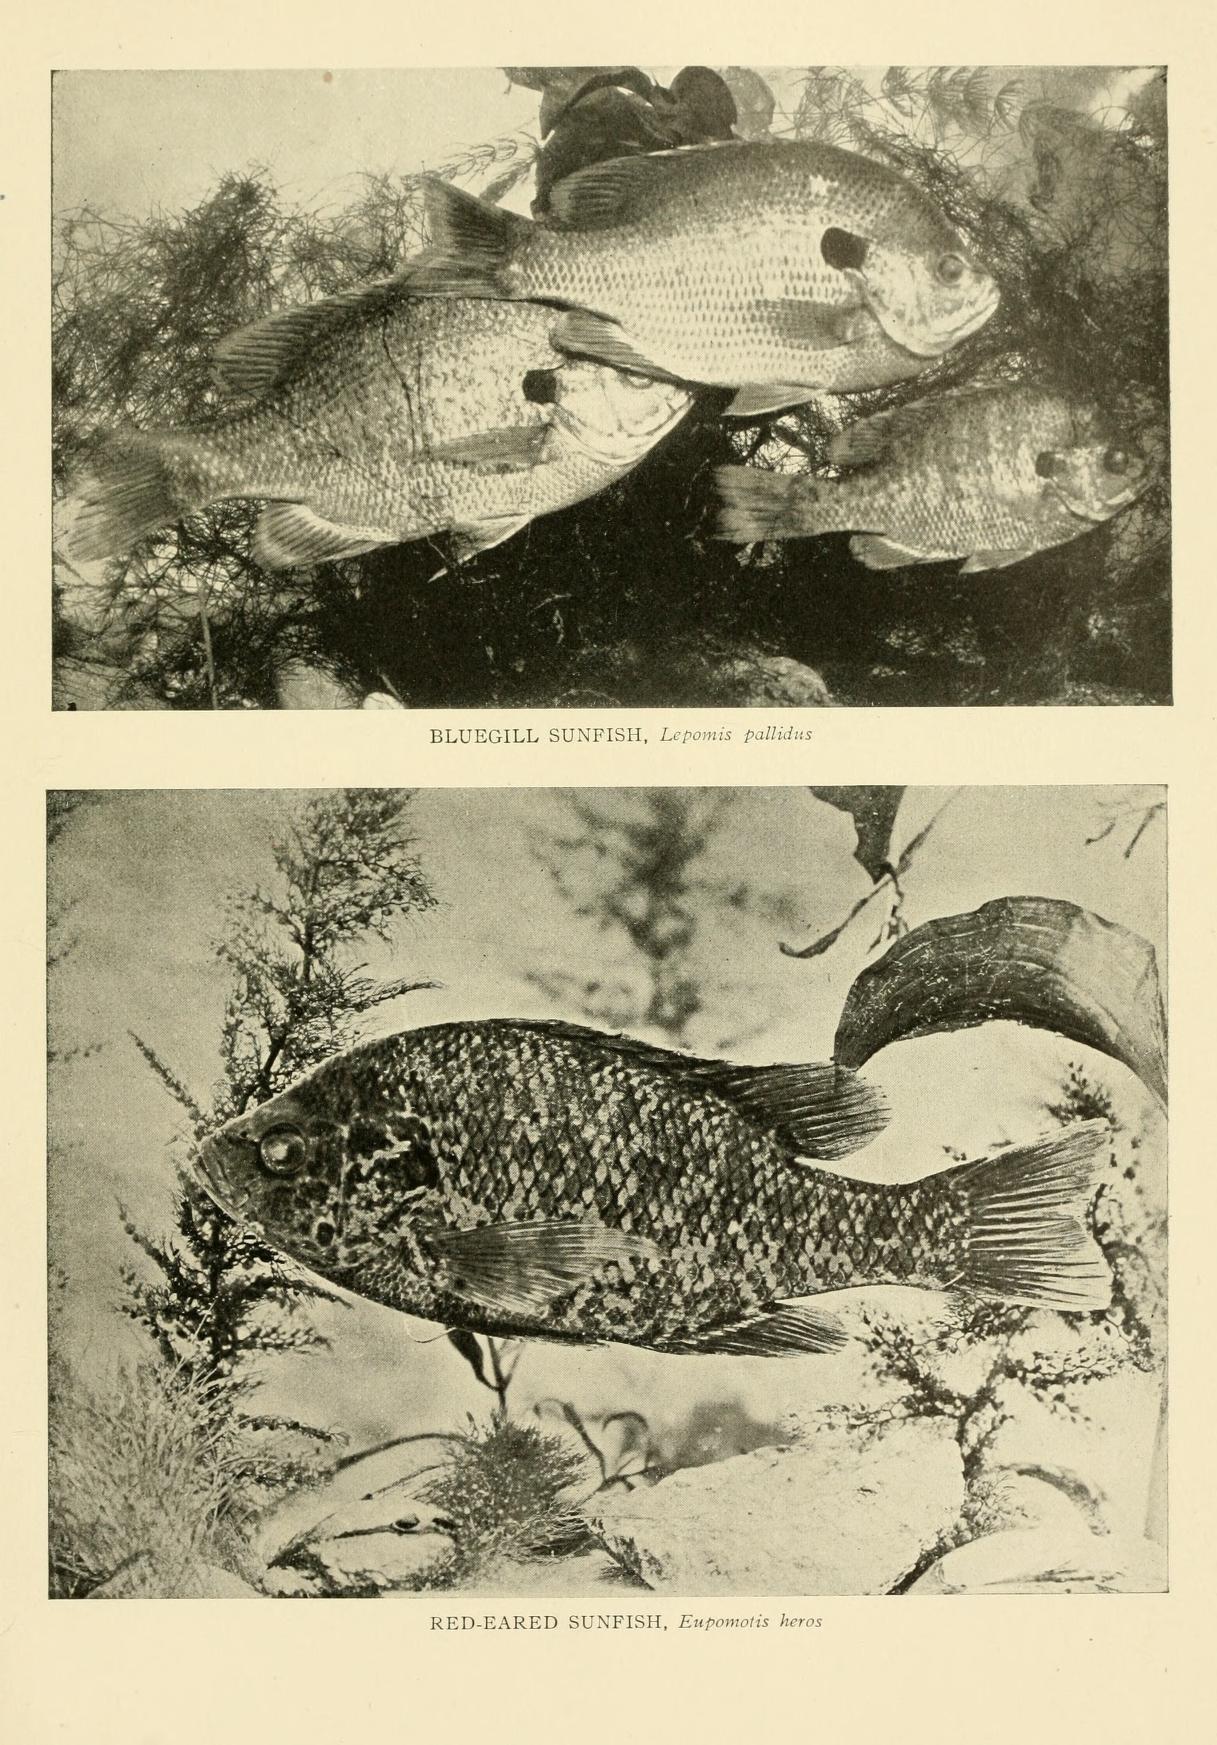 Image of Bluegill sunfish